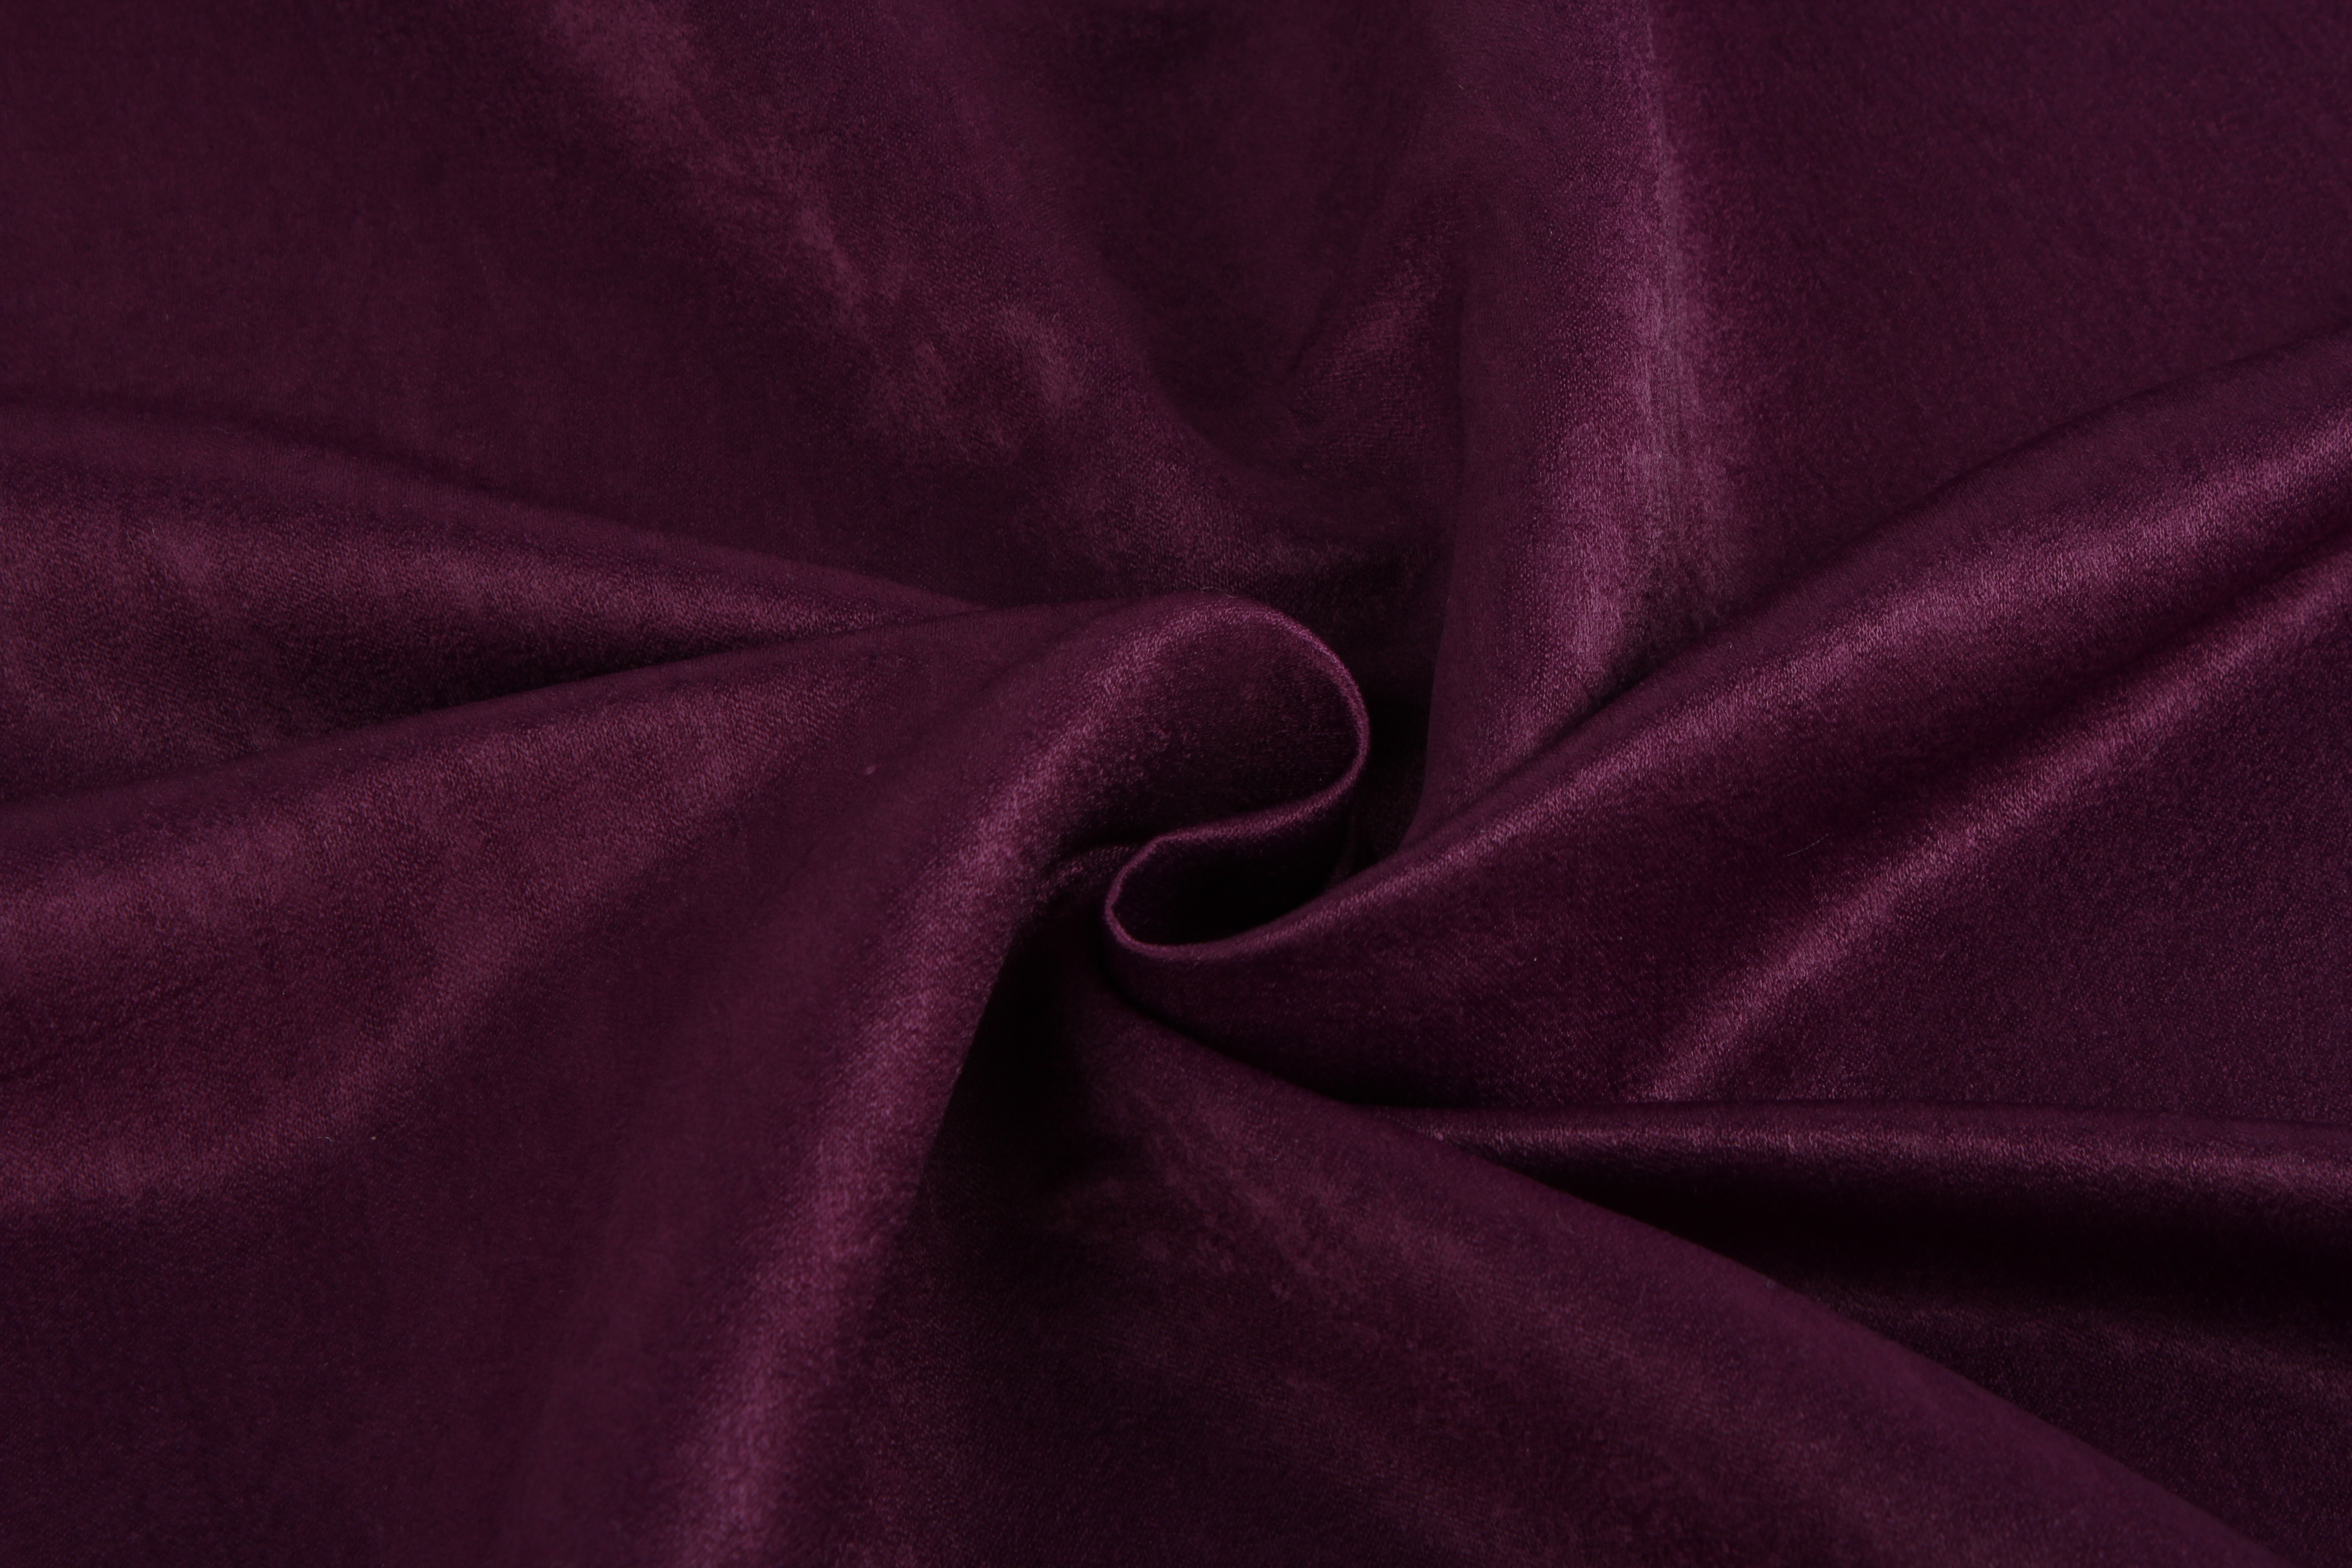 {} TexRepublic Материал Портьерная ткань Palette Цвет: Фиолетовый texrepublic материал портьерная ткань palette цвет брусничный